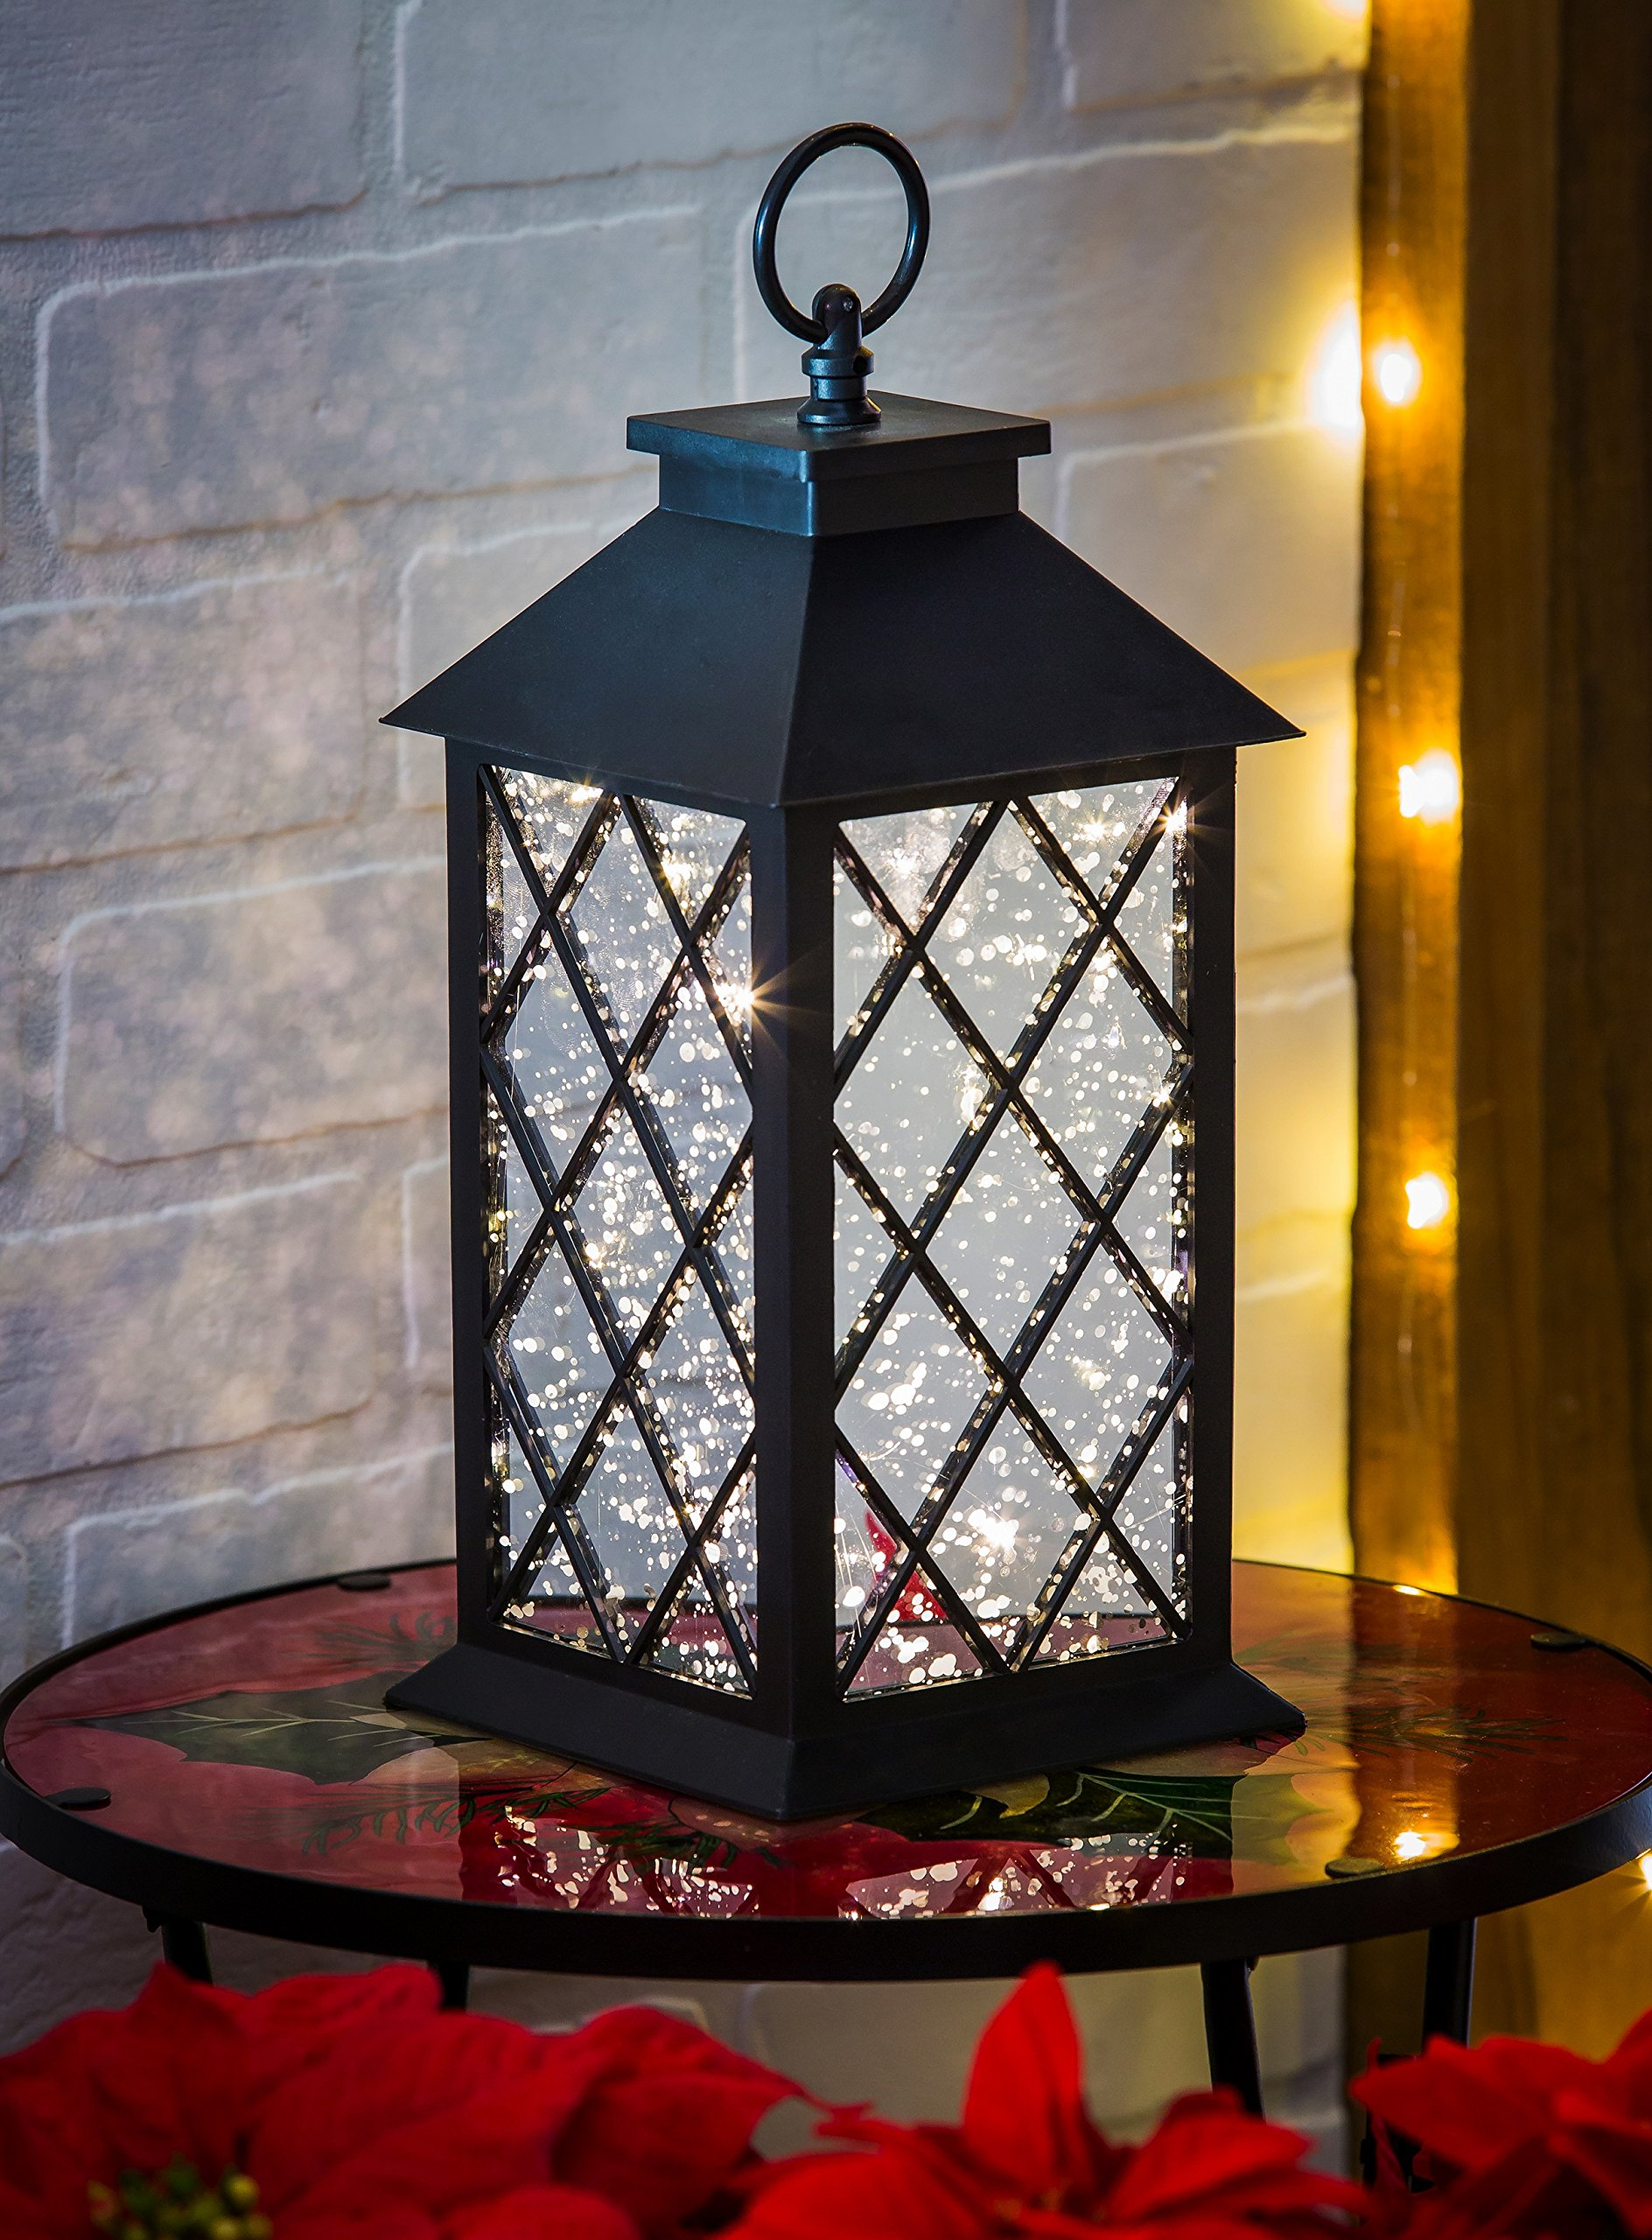 New Creative Black Lantern with Sparkling LED lights